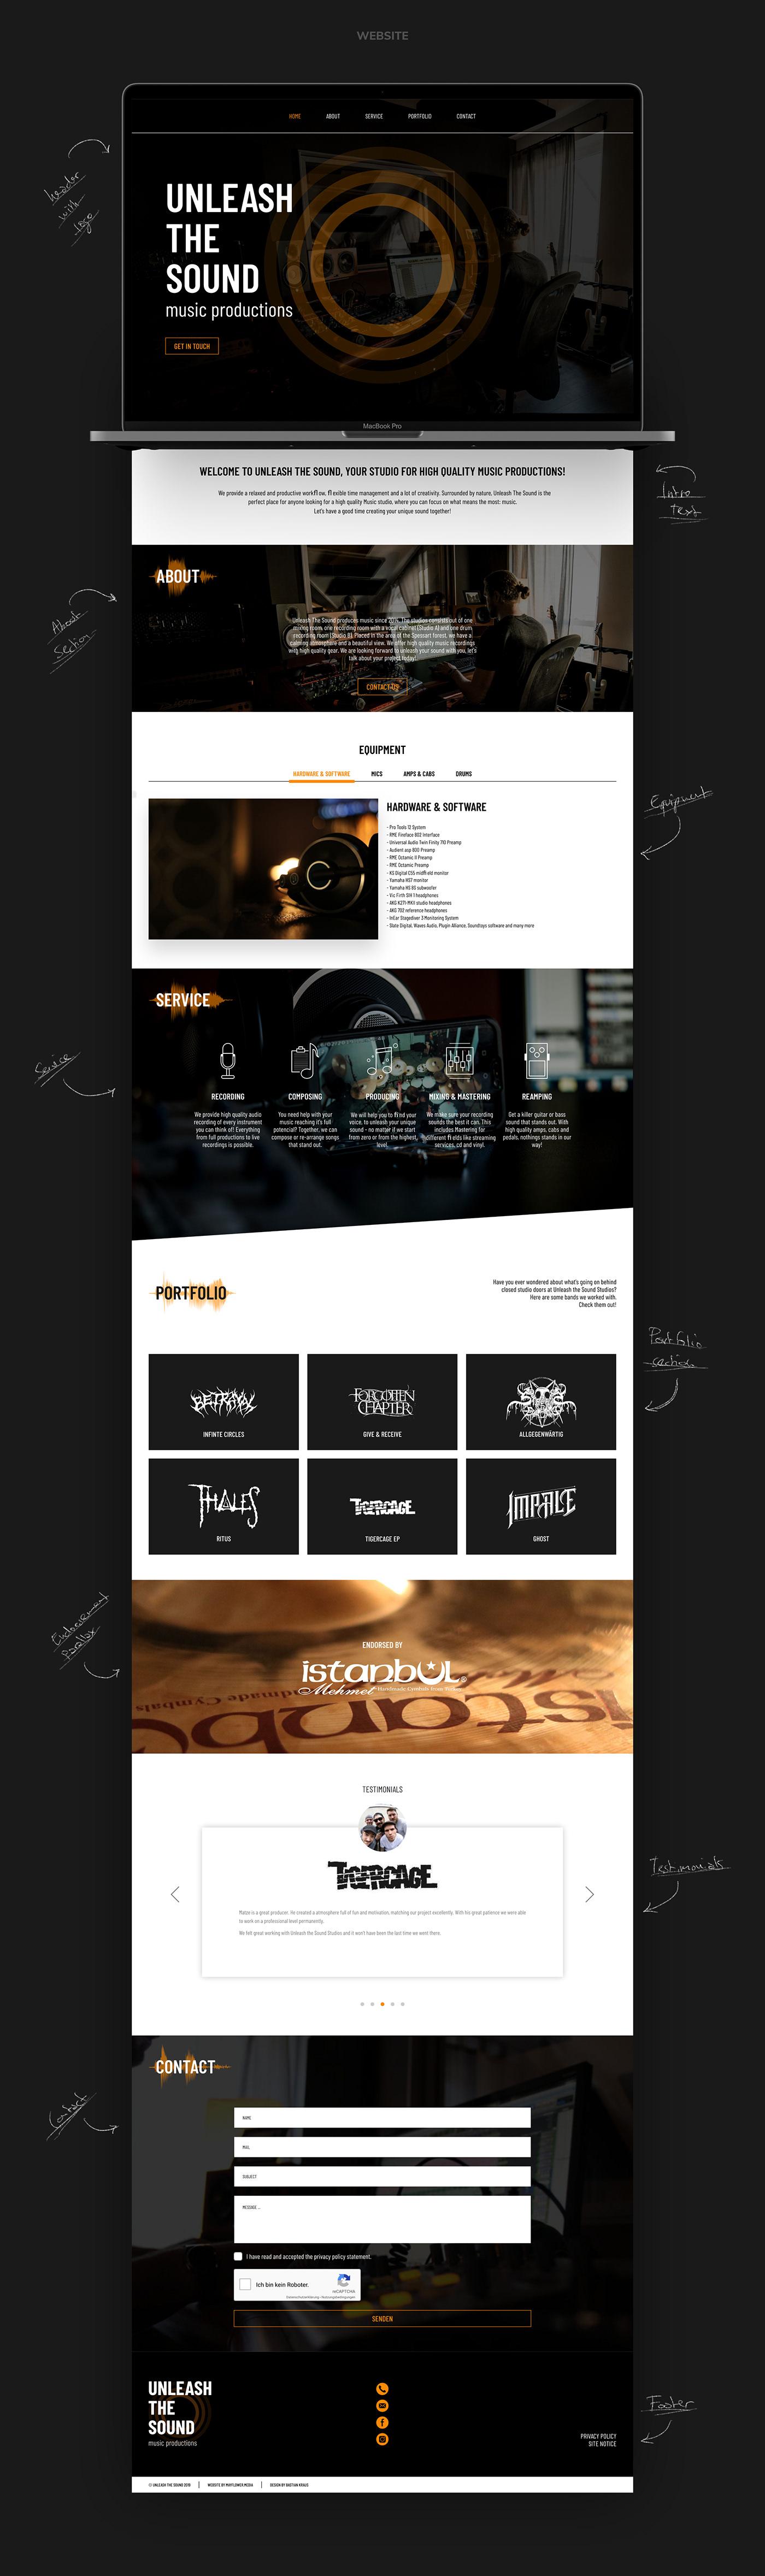 Unleash The Sound // Website